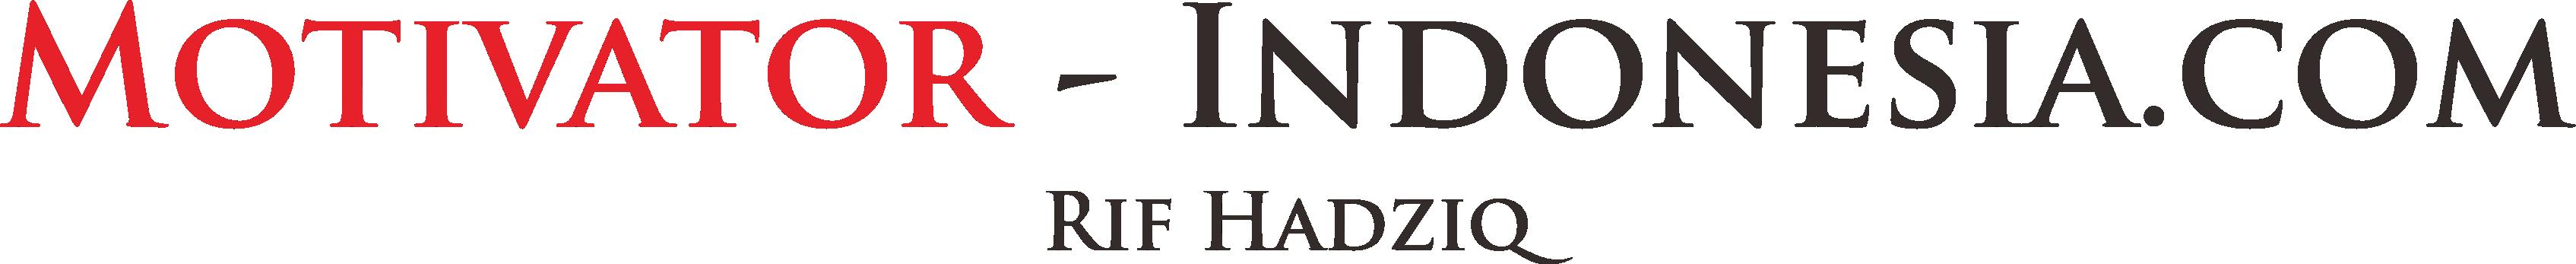 motivato indonesia, motivator perusahaan, rif hadziq